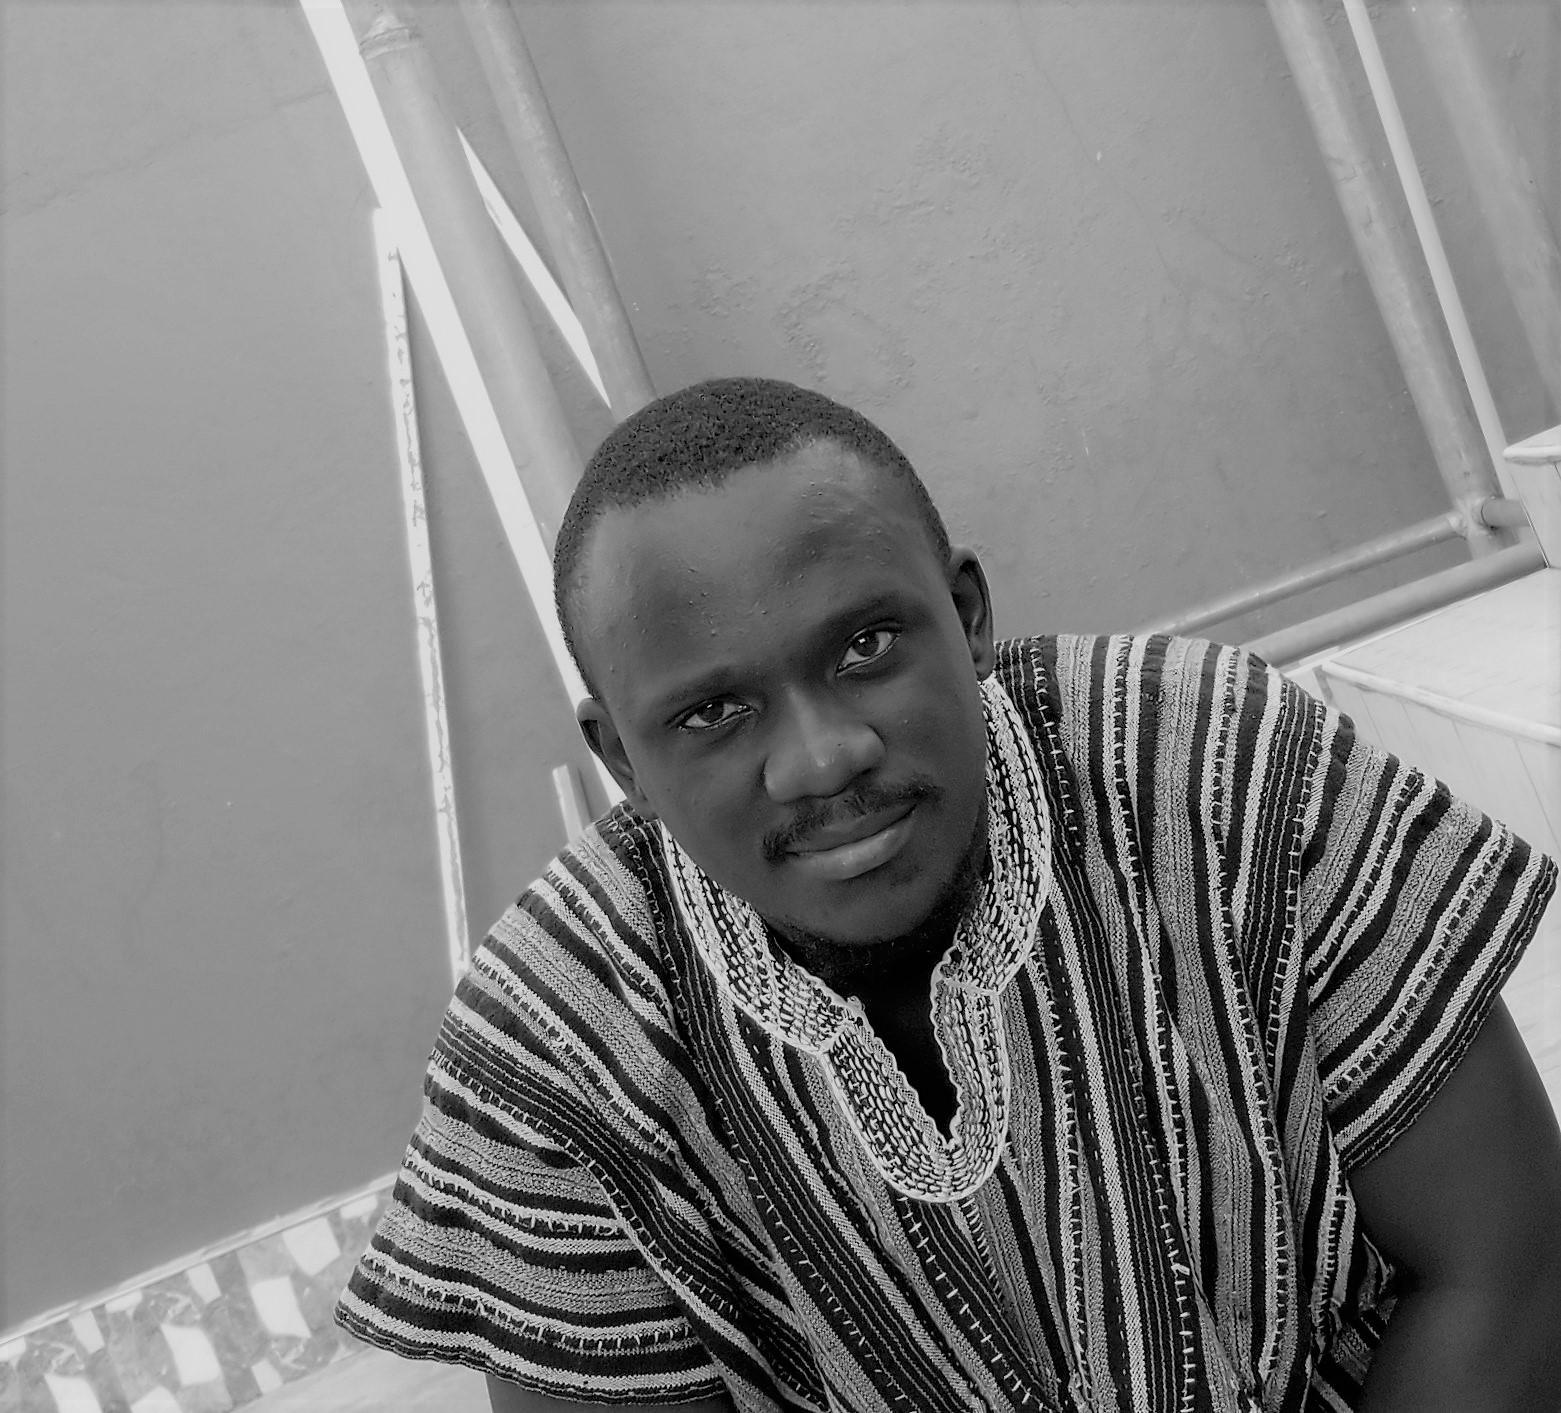 Akwasi Bediako Afrane, artist